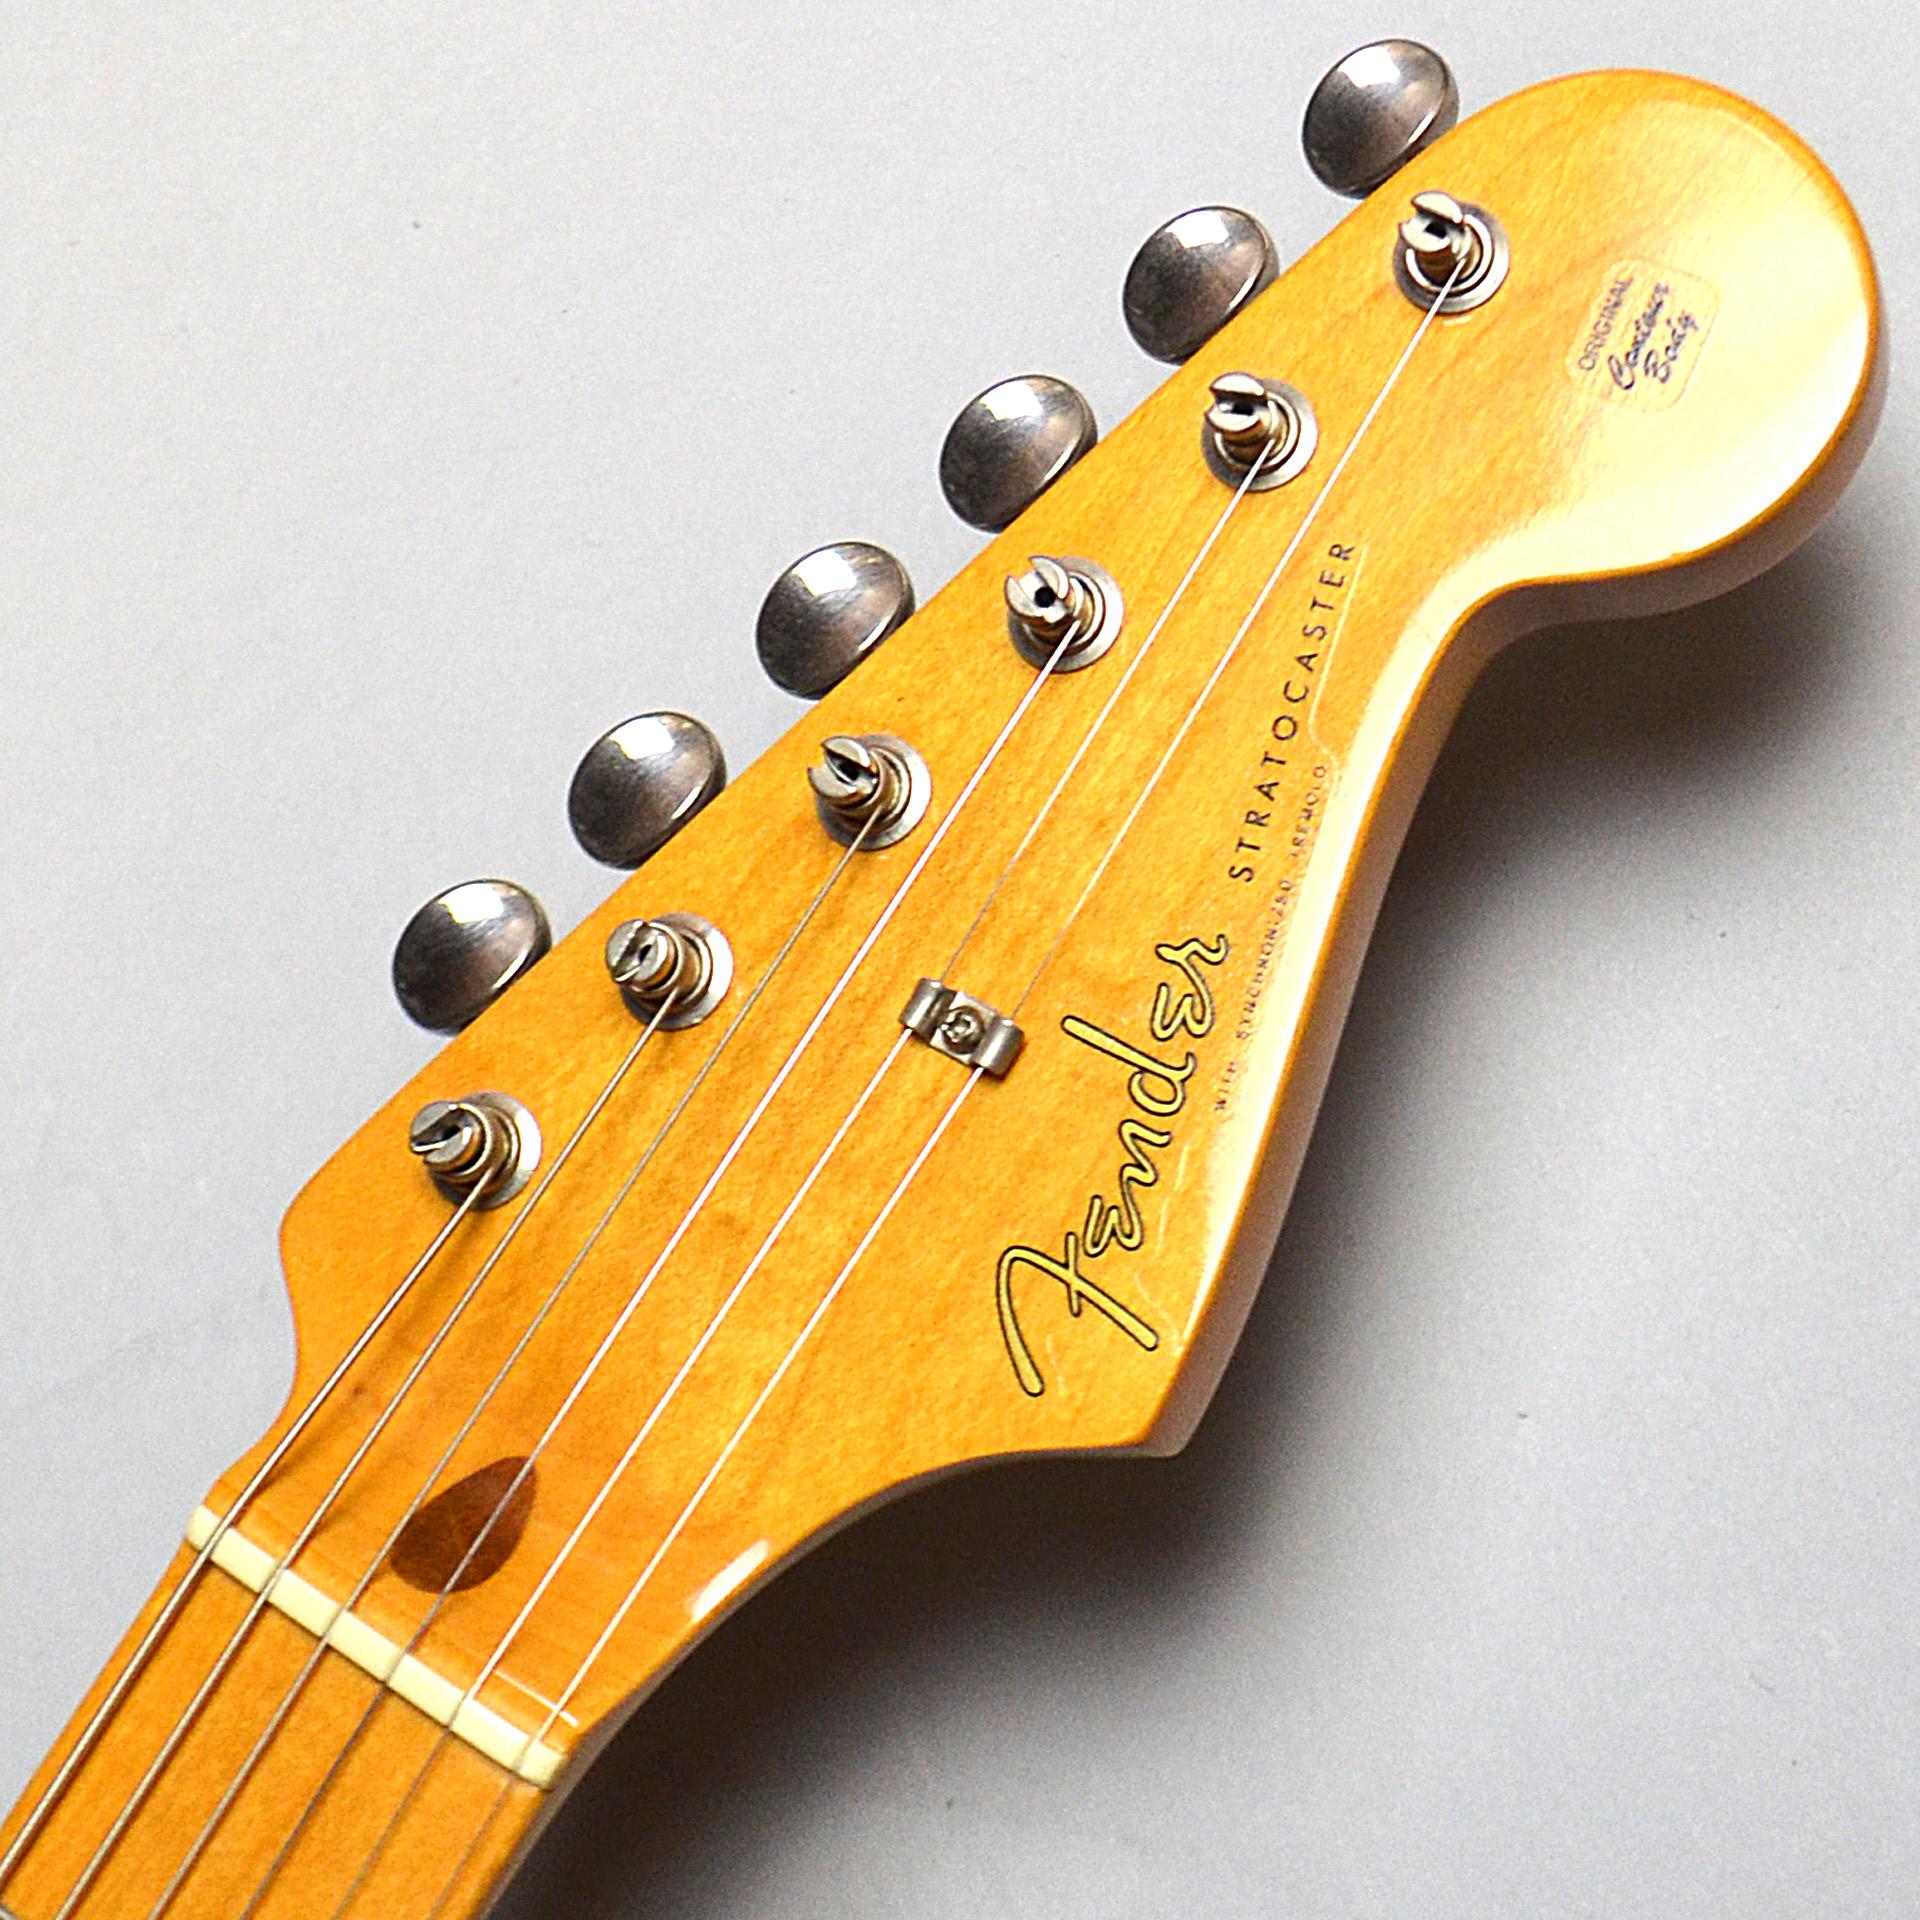 American Vintage '57 Stratocasterのヘッド画像